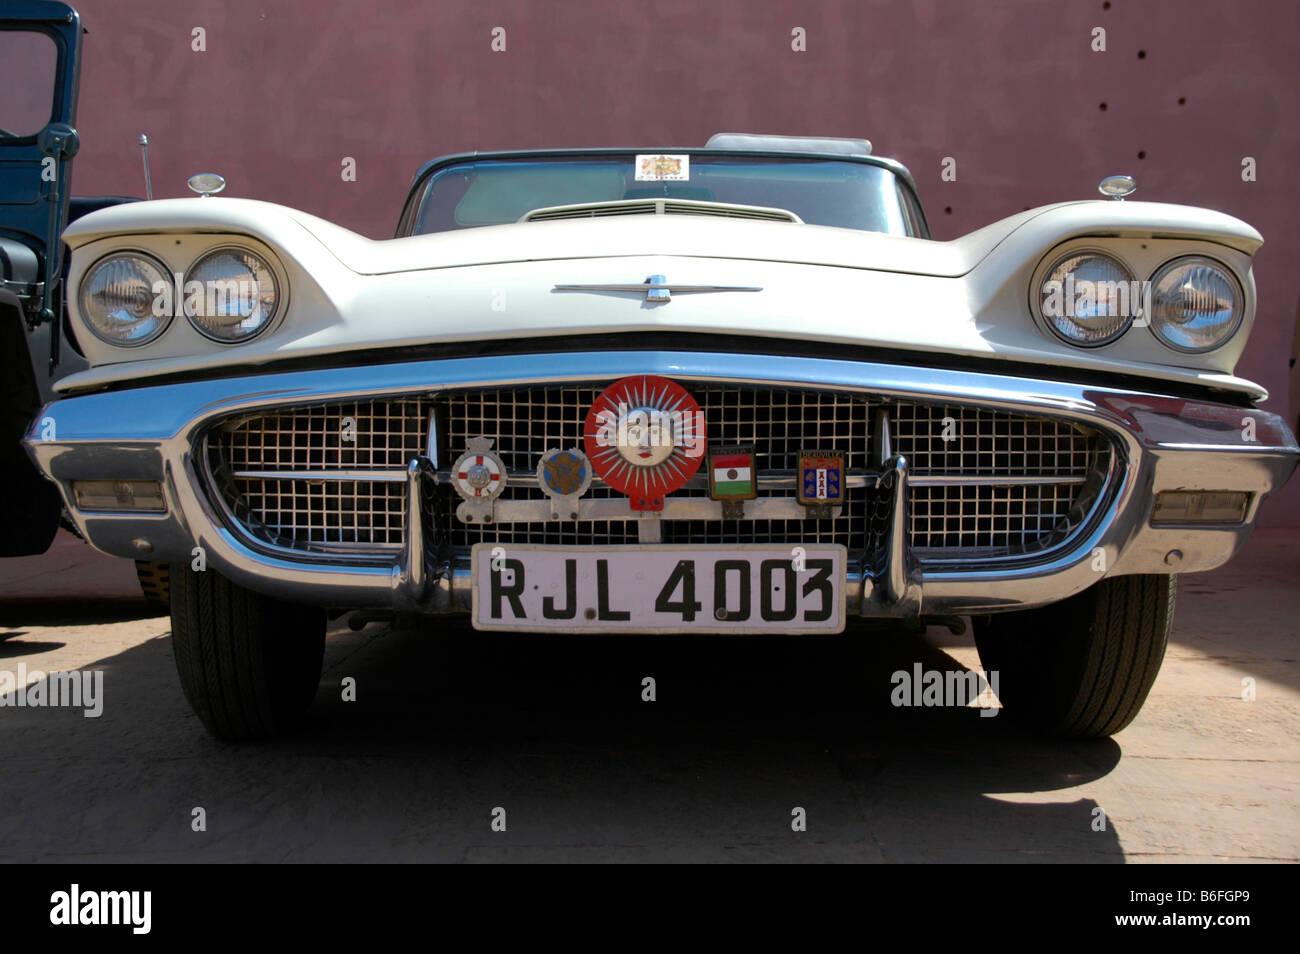 American vintage car with Indian number plates in Jaipur, Rajasthan ...